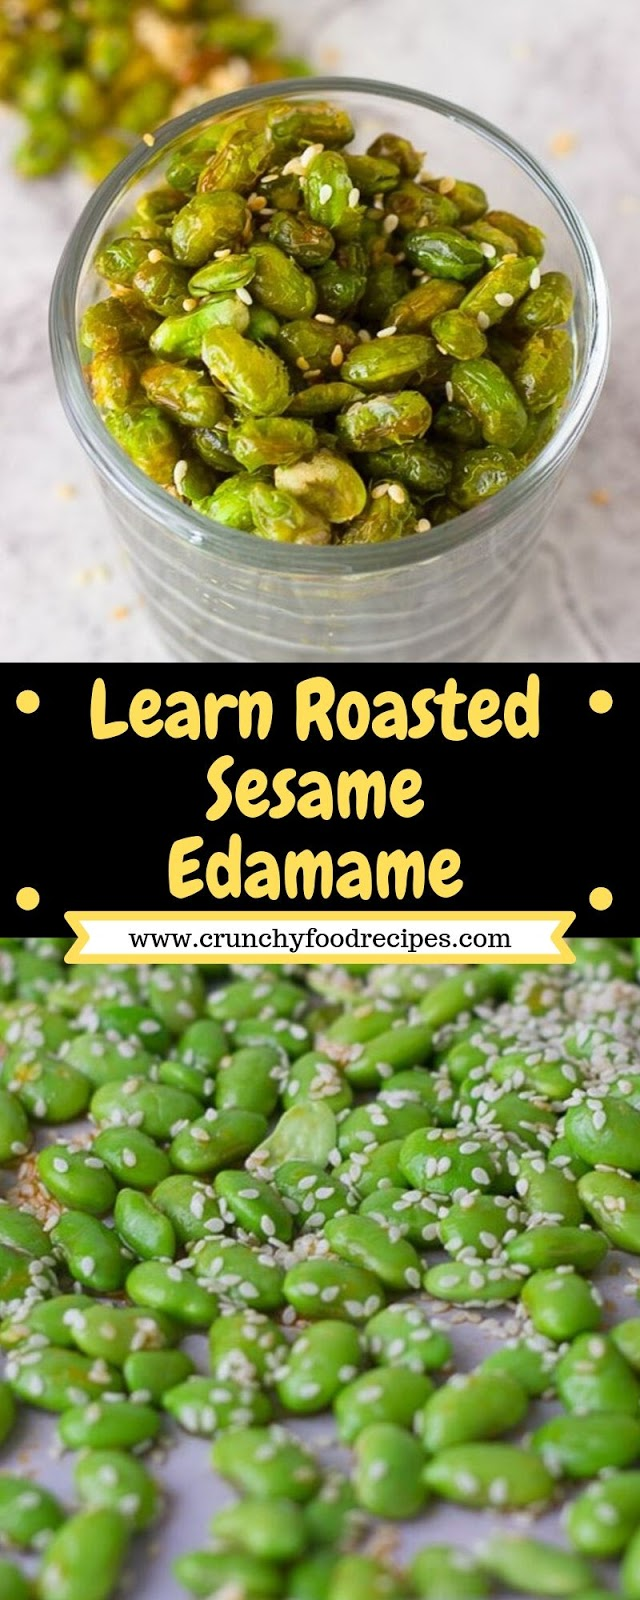 Learn Roasted Sesame Edamame